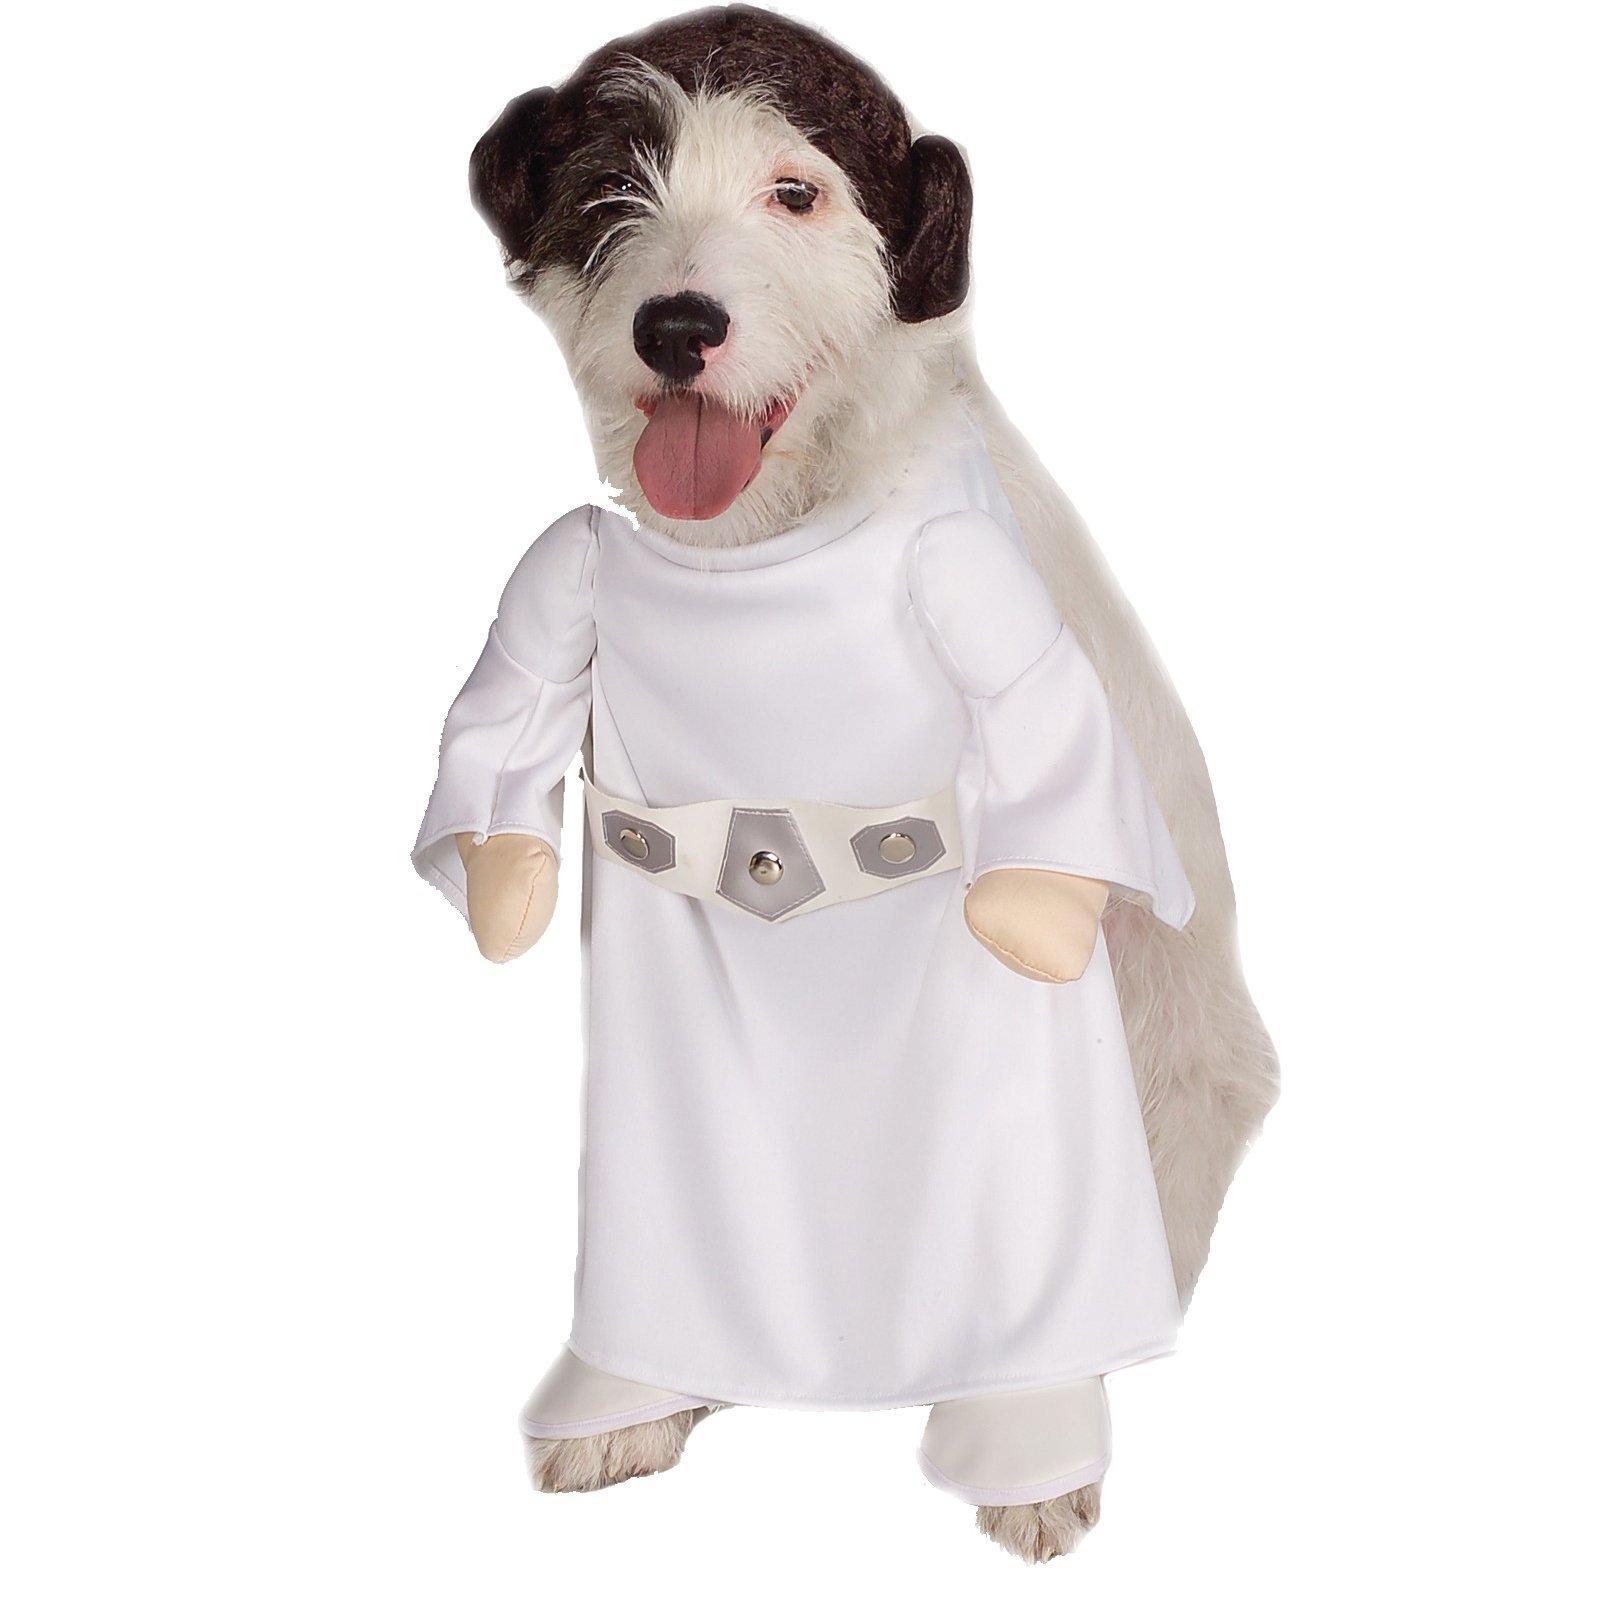 Princess Leia Pet Pet Costume - X-Large by Rubie's Costume Co